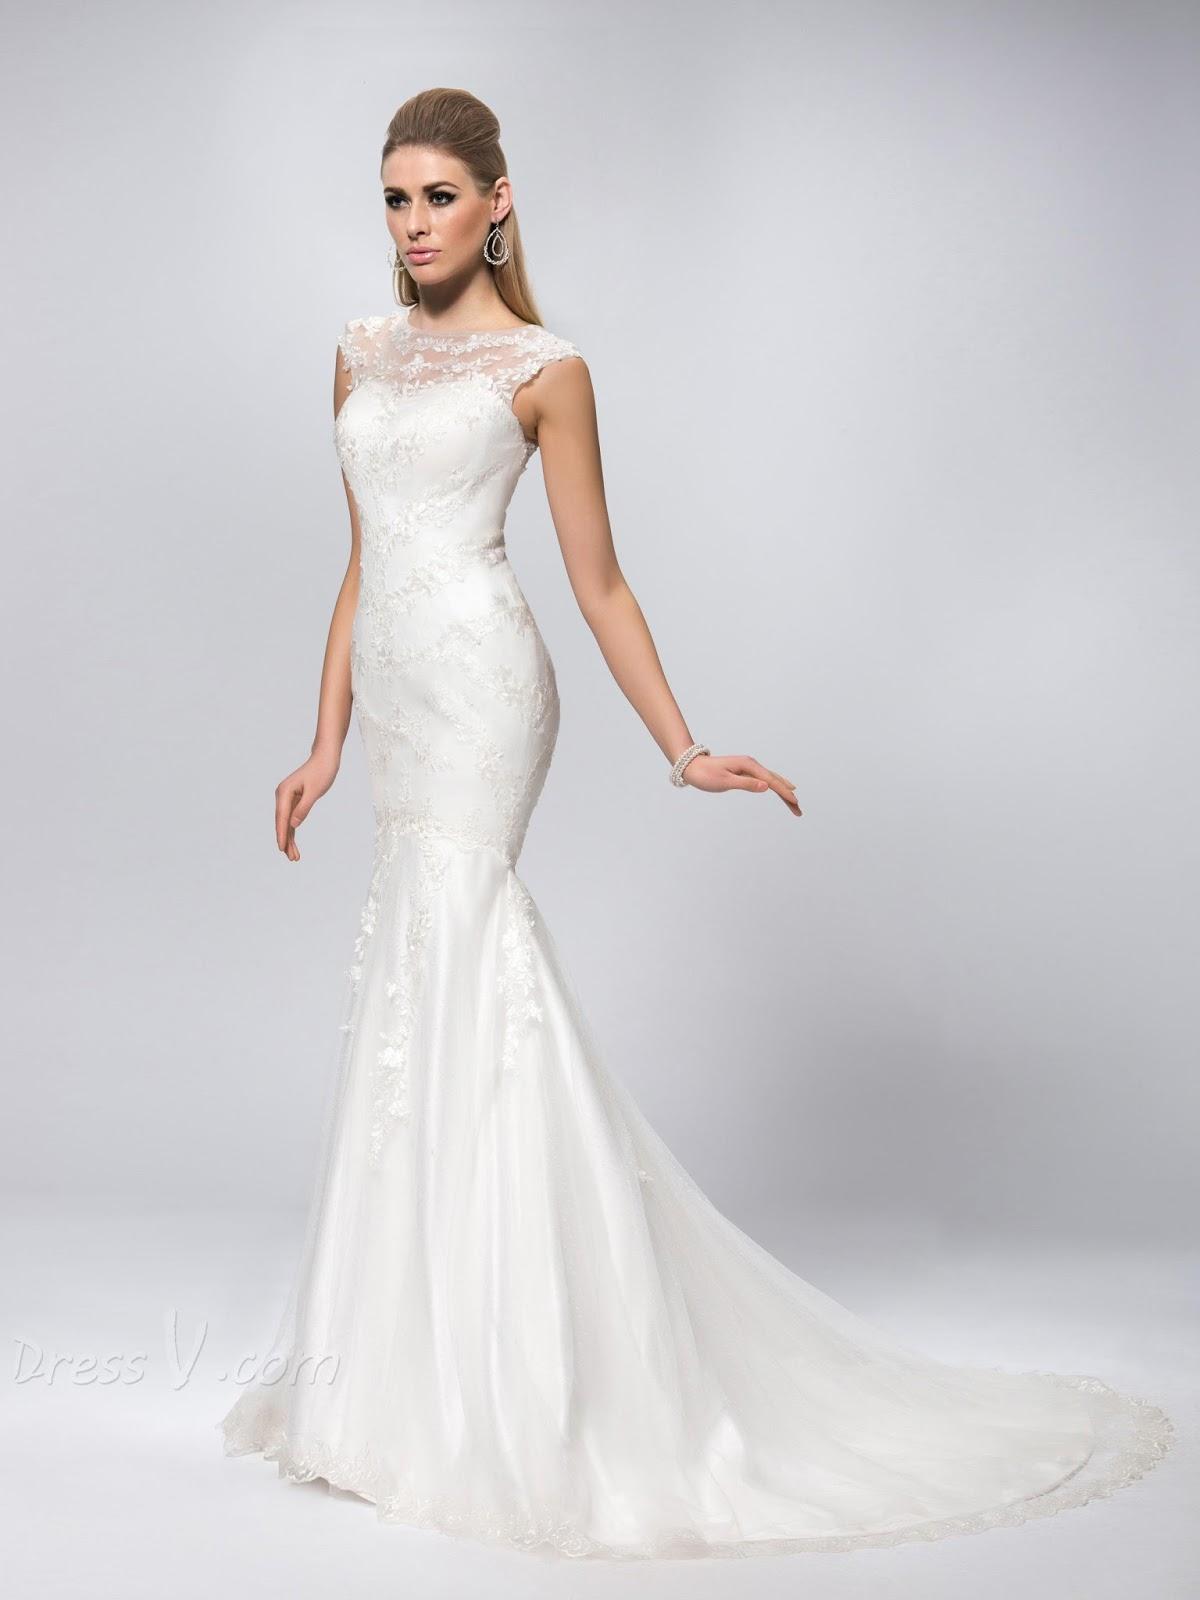 Mermaid Tail Wedding Dress Ideas ff7cd65502d0